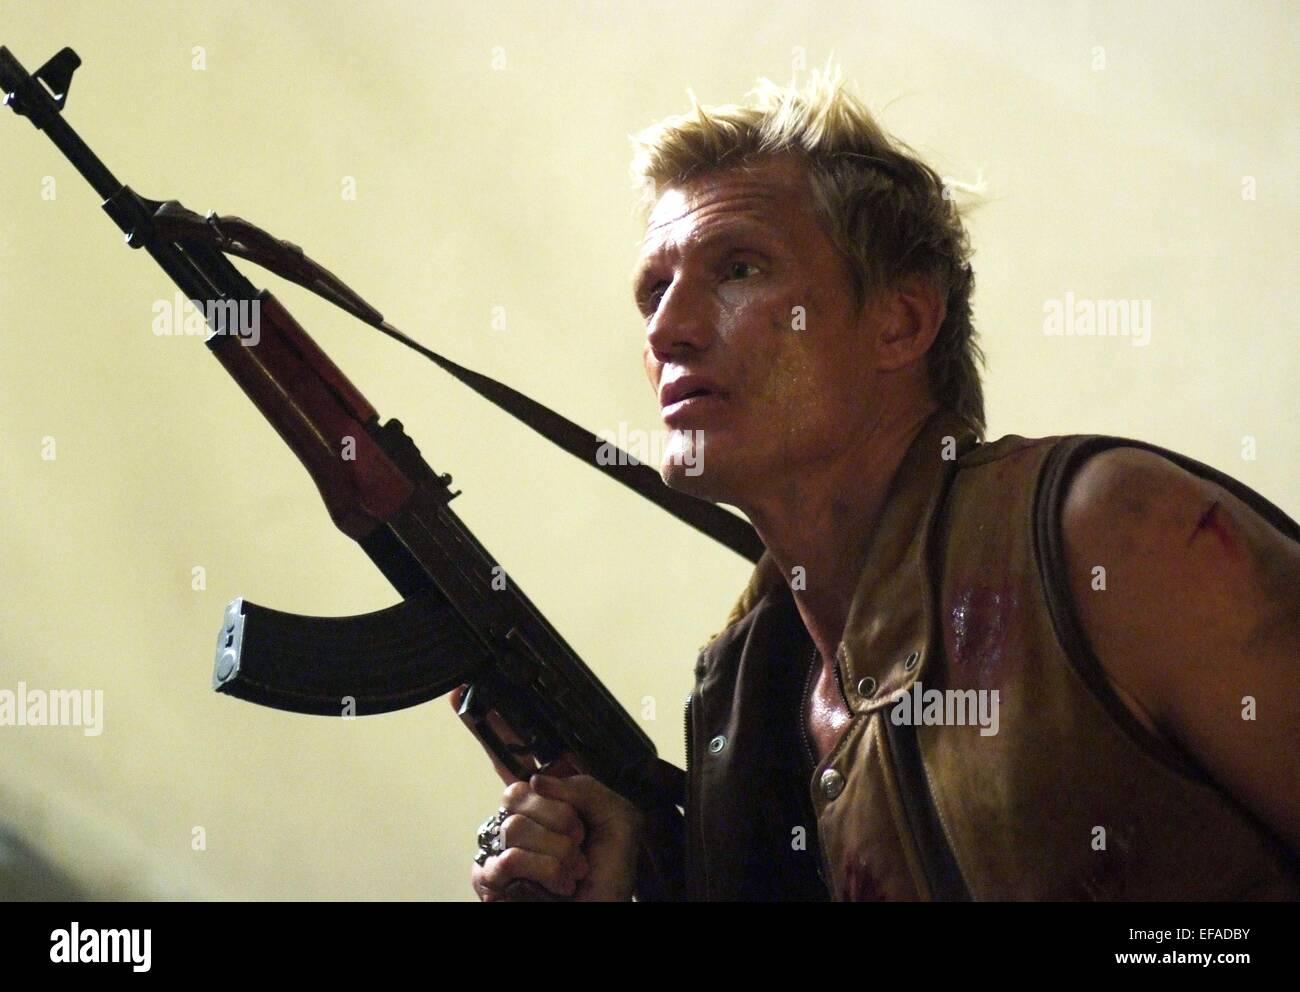 DOLPH LUNDGREN COMMAND PERFORMANCE (2009) - Stock Image